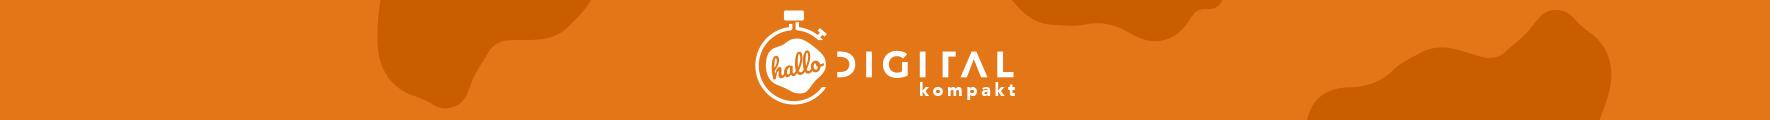 hallo.digital kompakt – 4 Stunden rund um digitales B2B Marketing